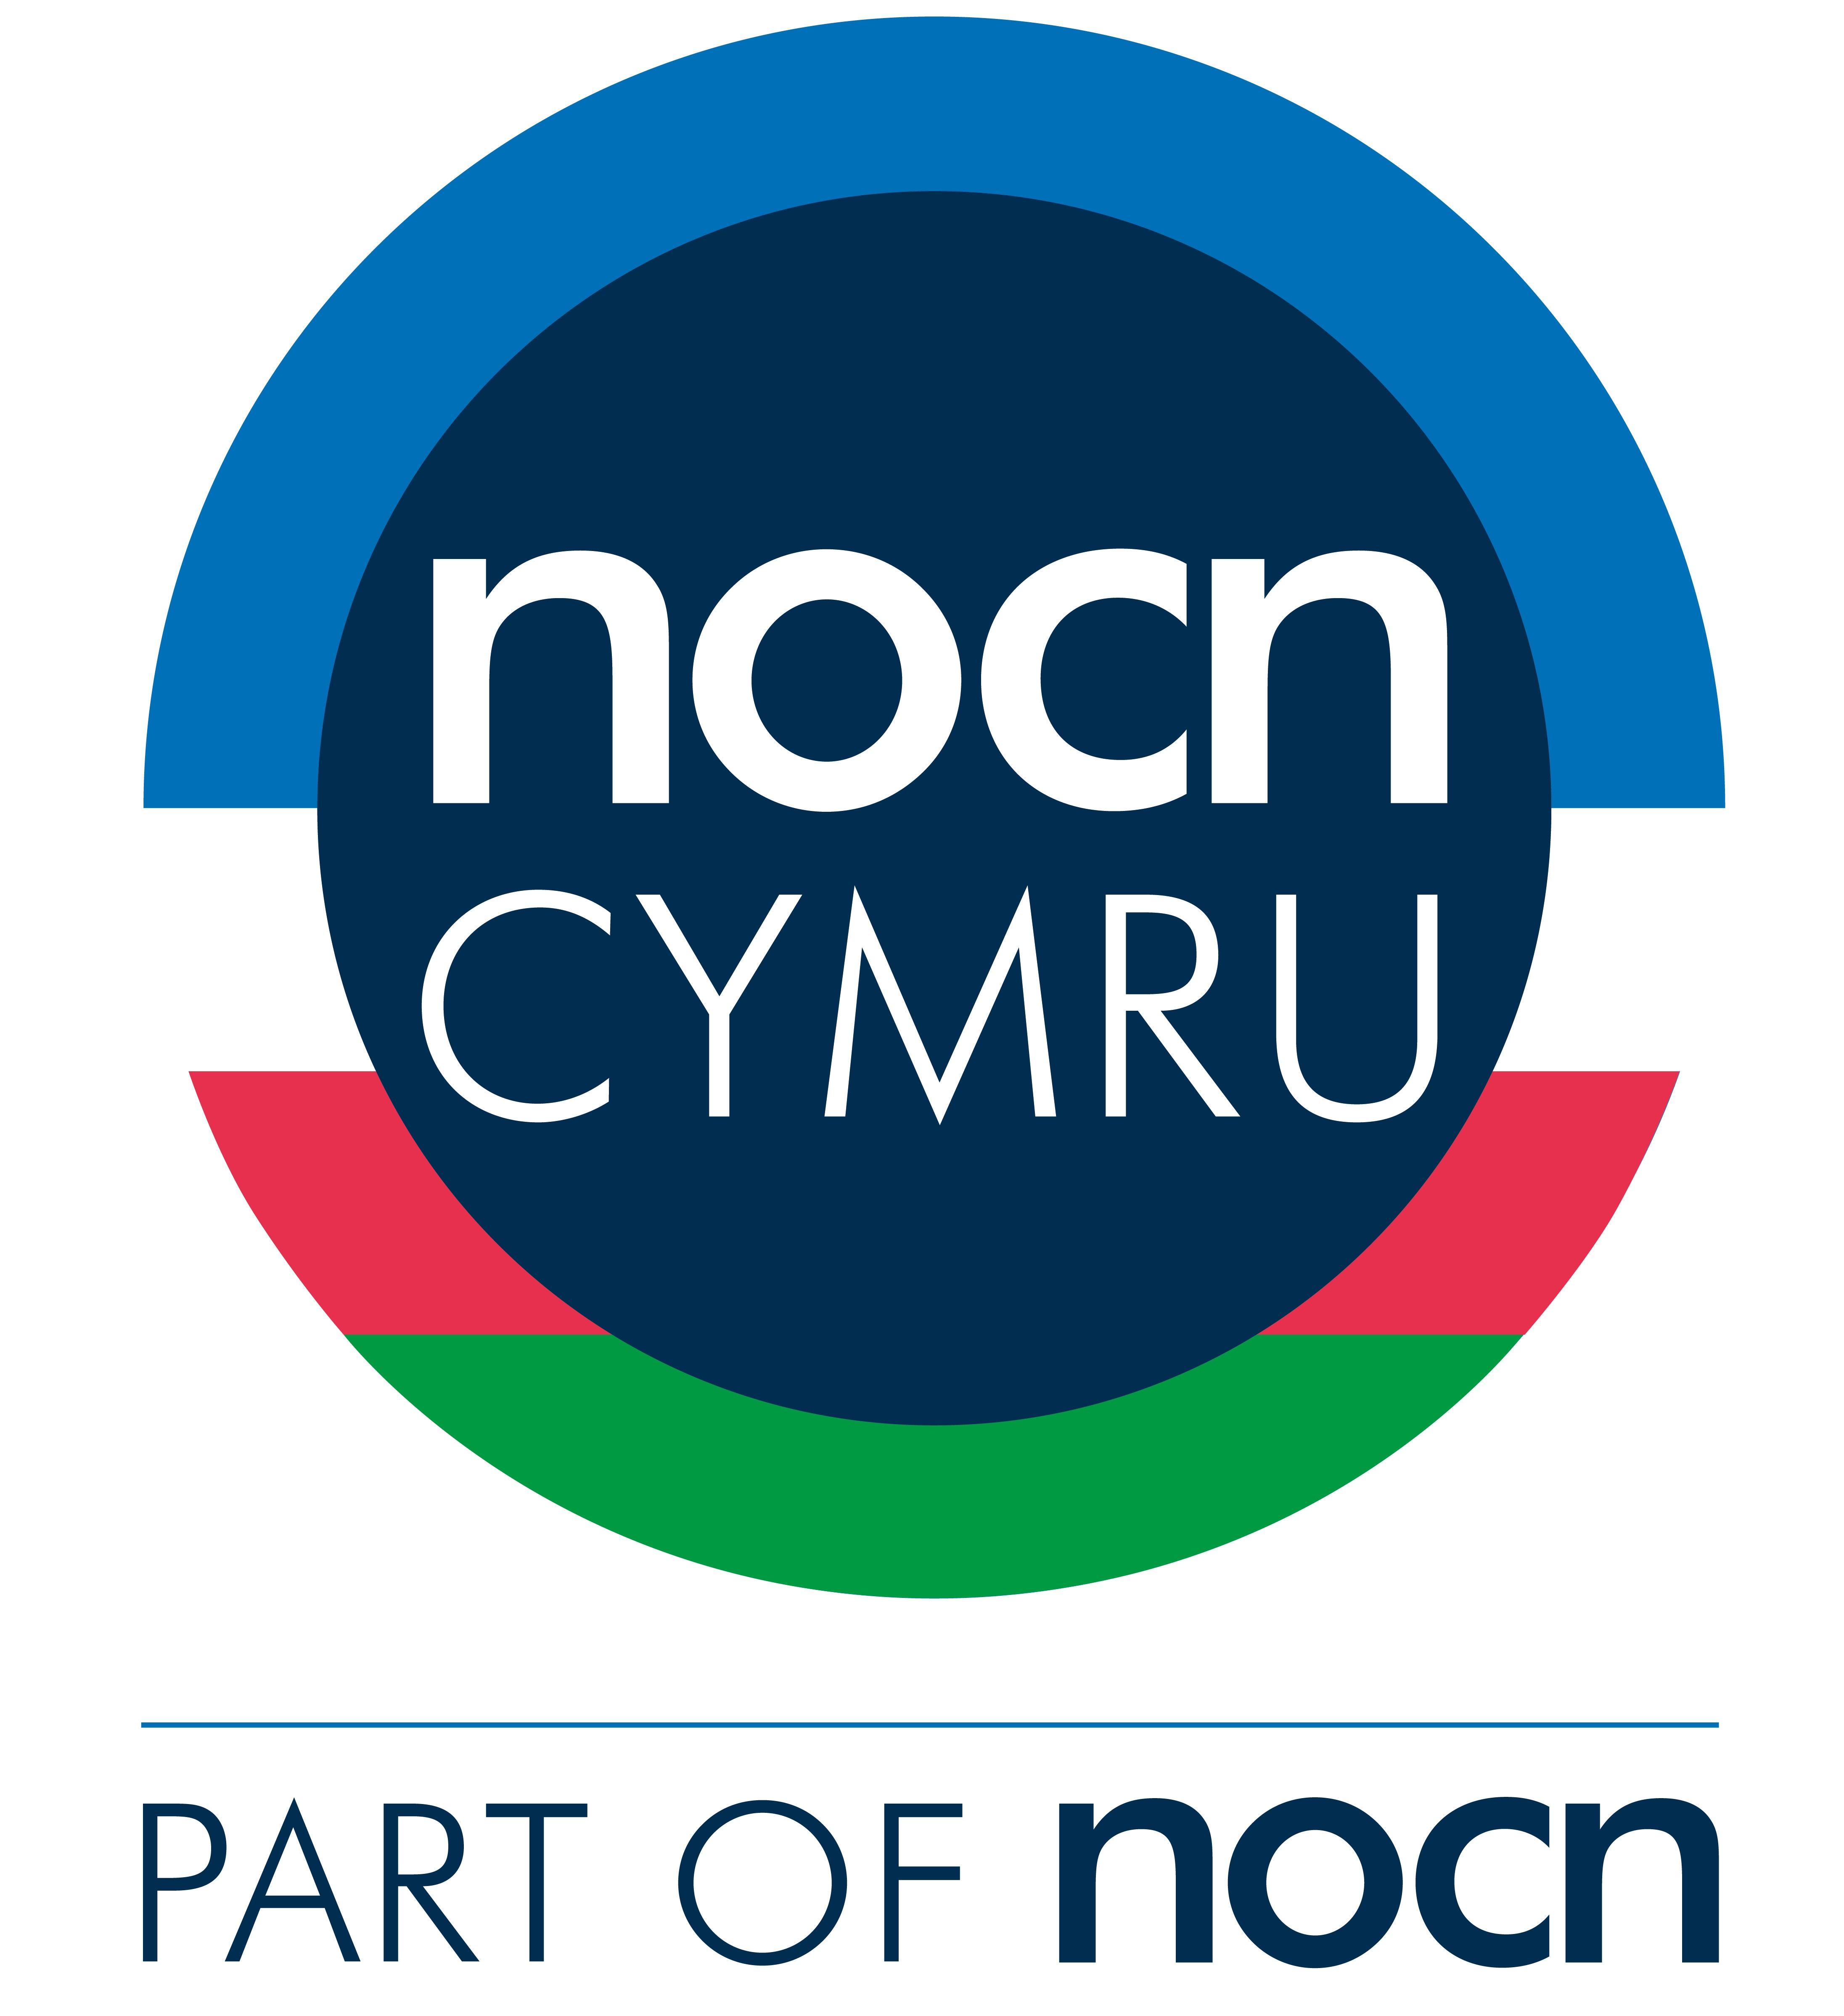 NOCN Cymru logo